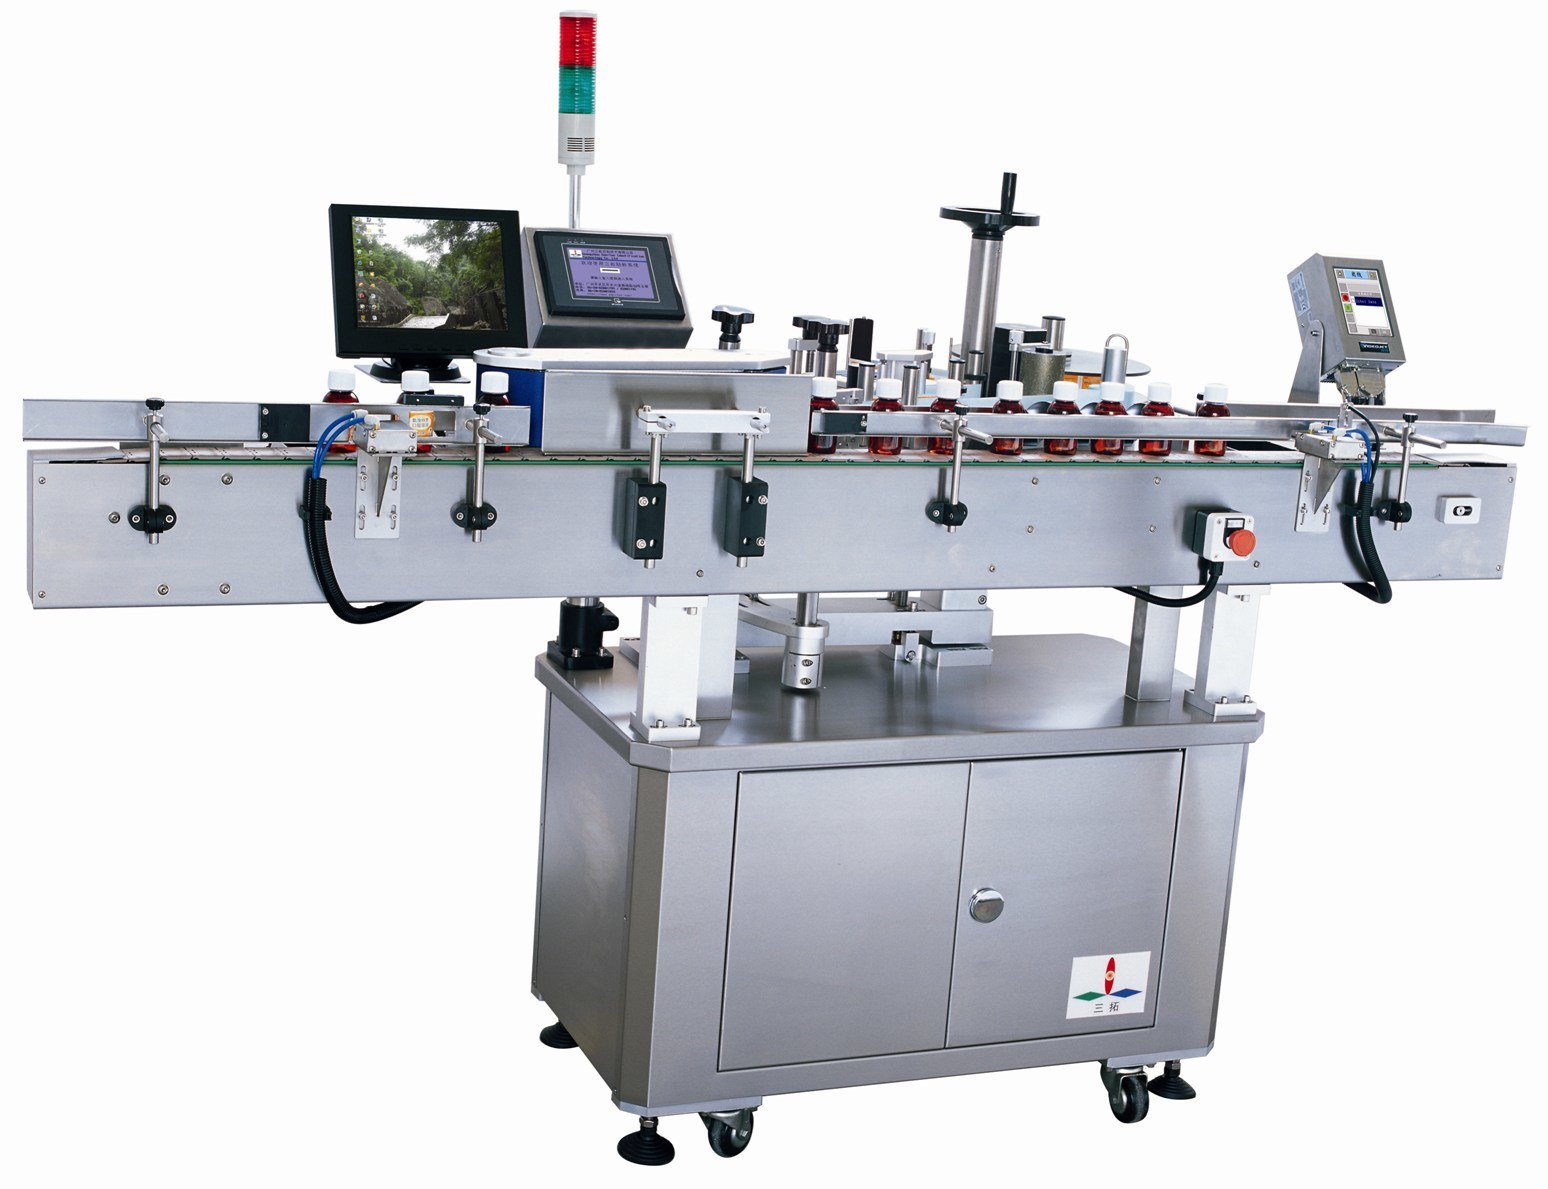 Santuo Intelligent Wrap Around Labeling Machine/Labeler